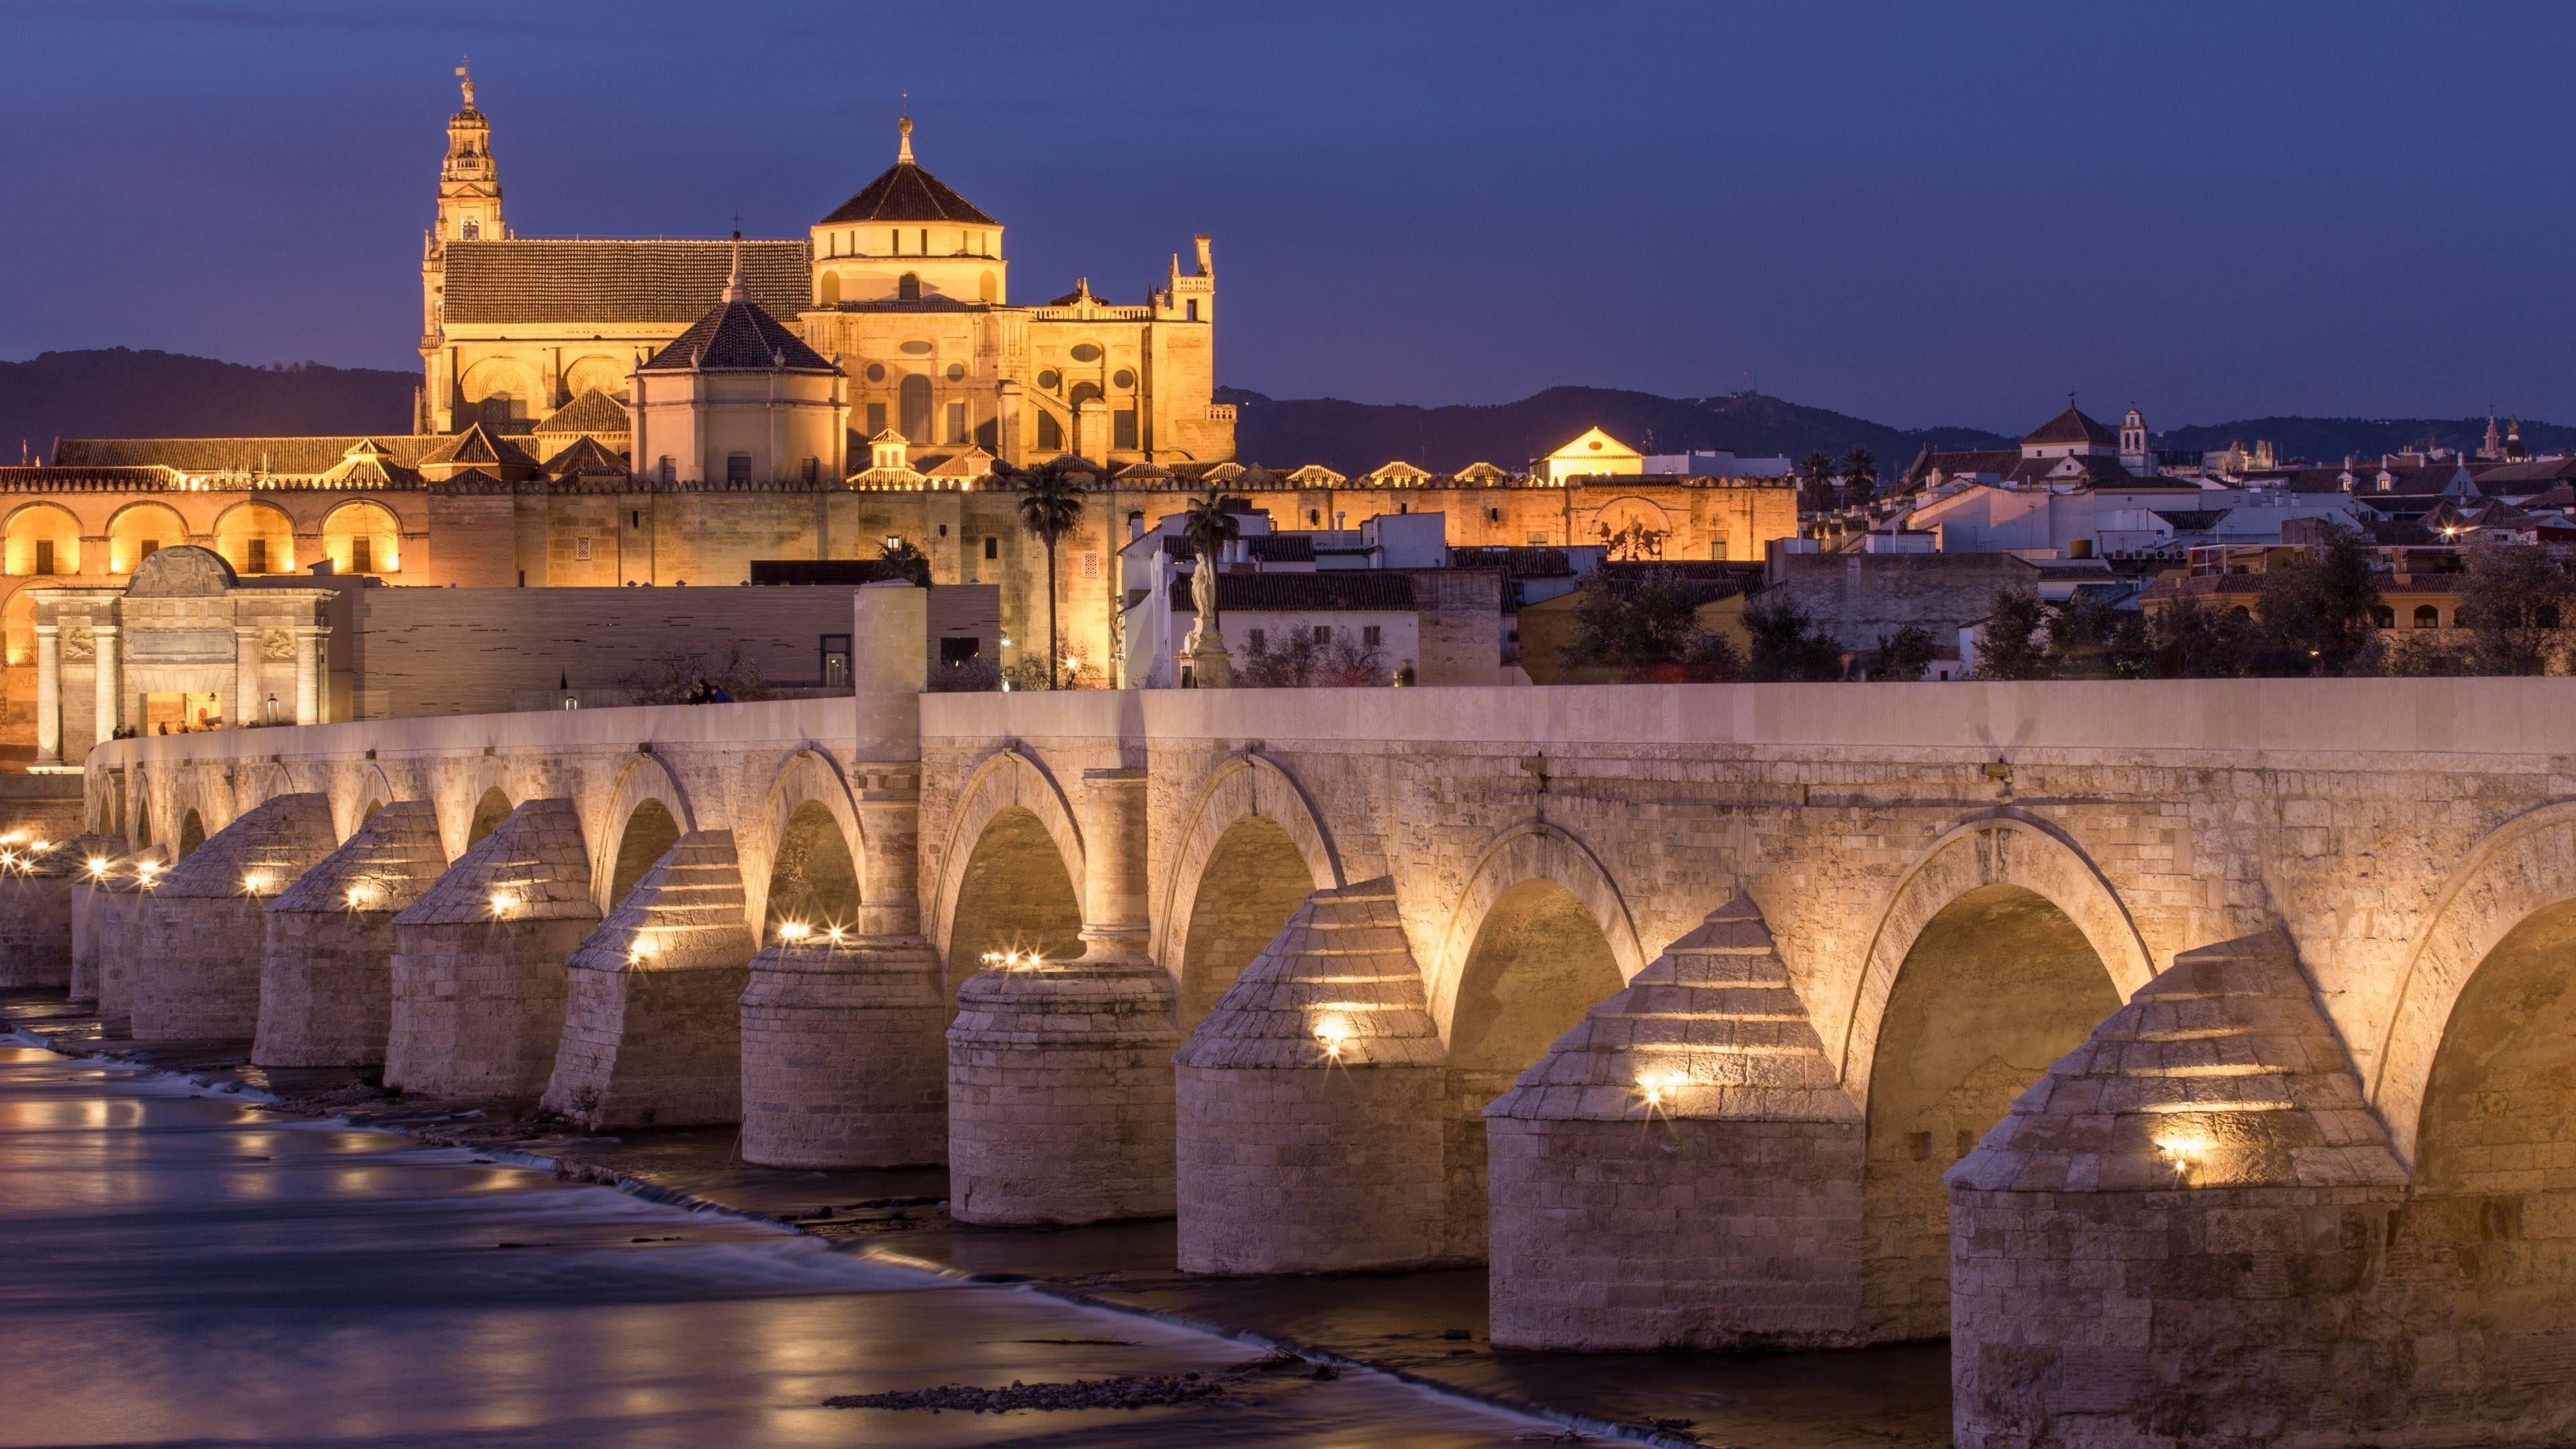 #bridge #night cordoba bridge great mosque #spain #travel #europe #mosque